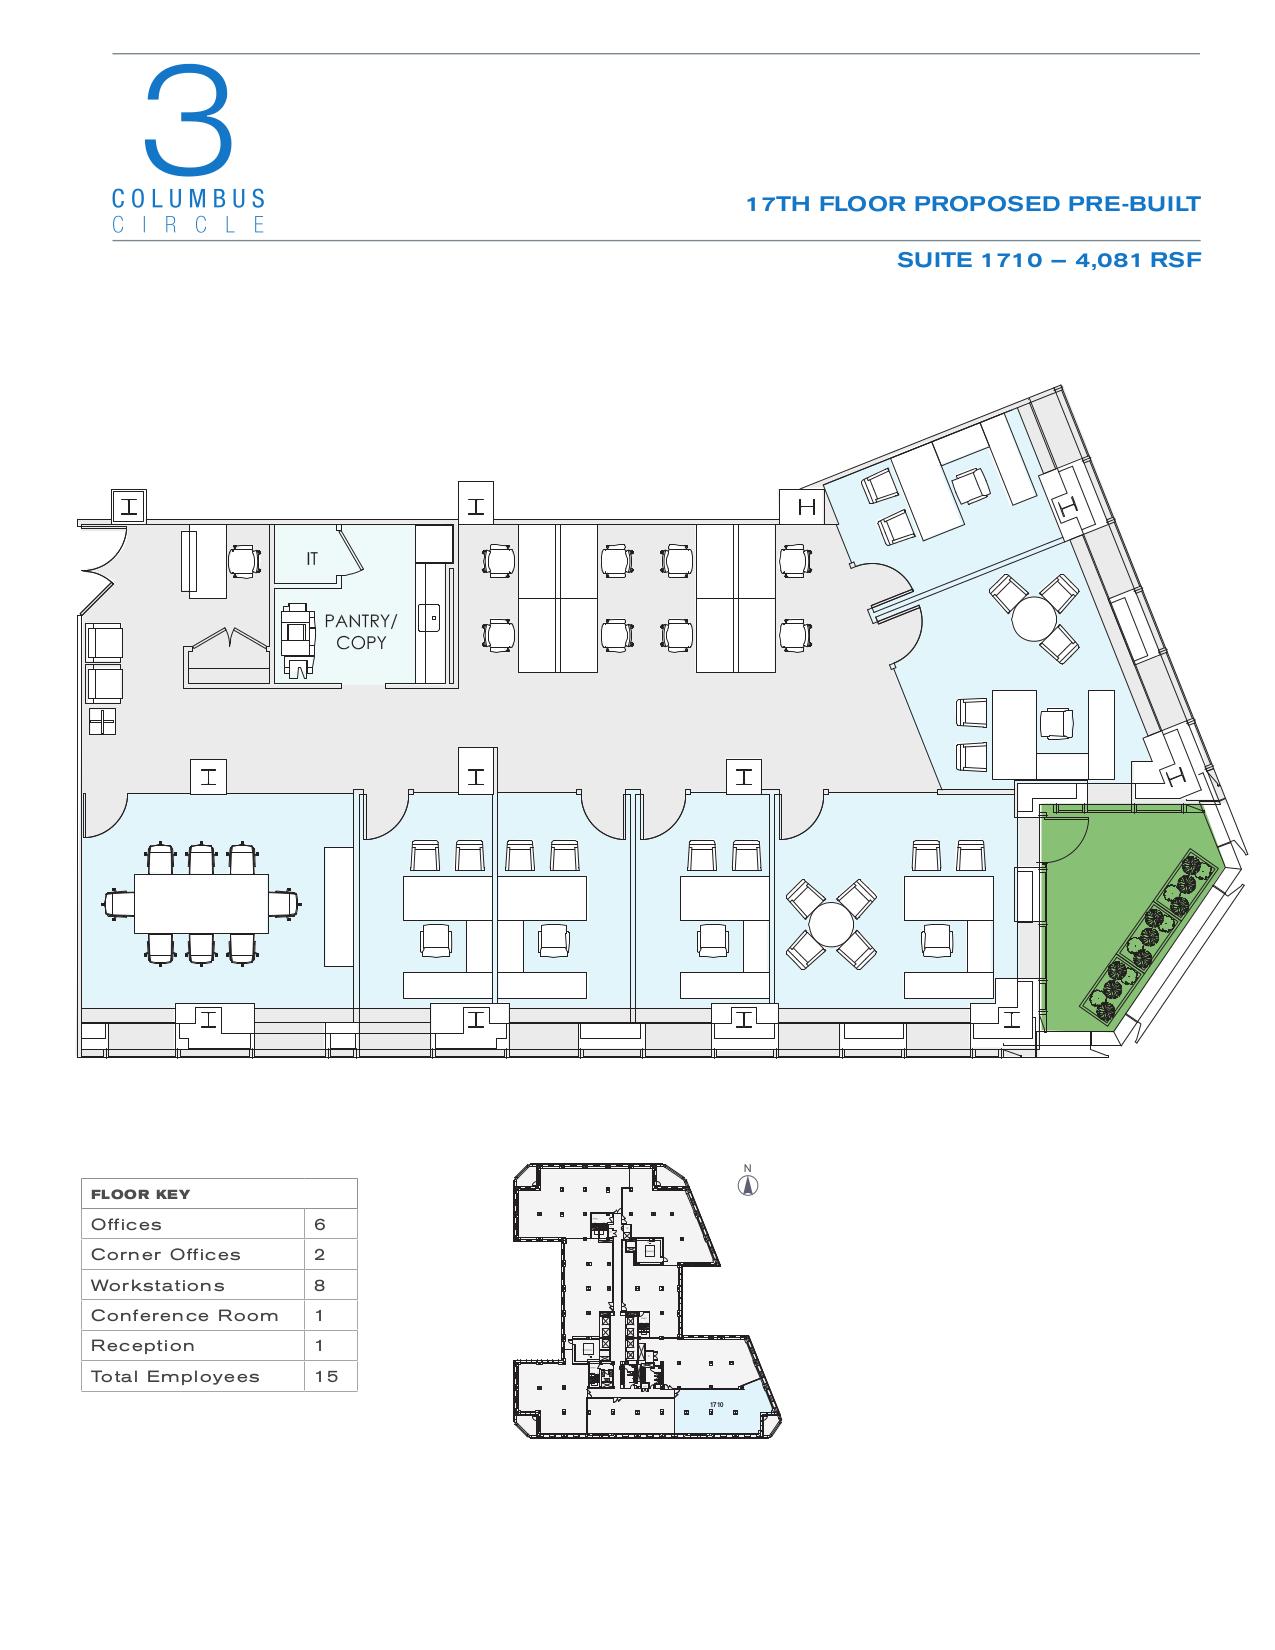 3 columbus circle 17th floor unit 1710 vts for 10 columbus circle 4th floor new york ny 10019